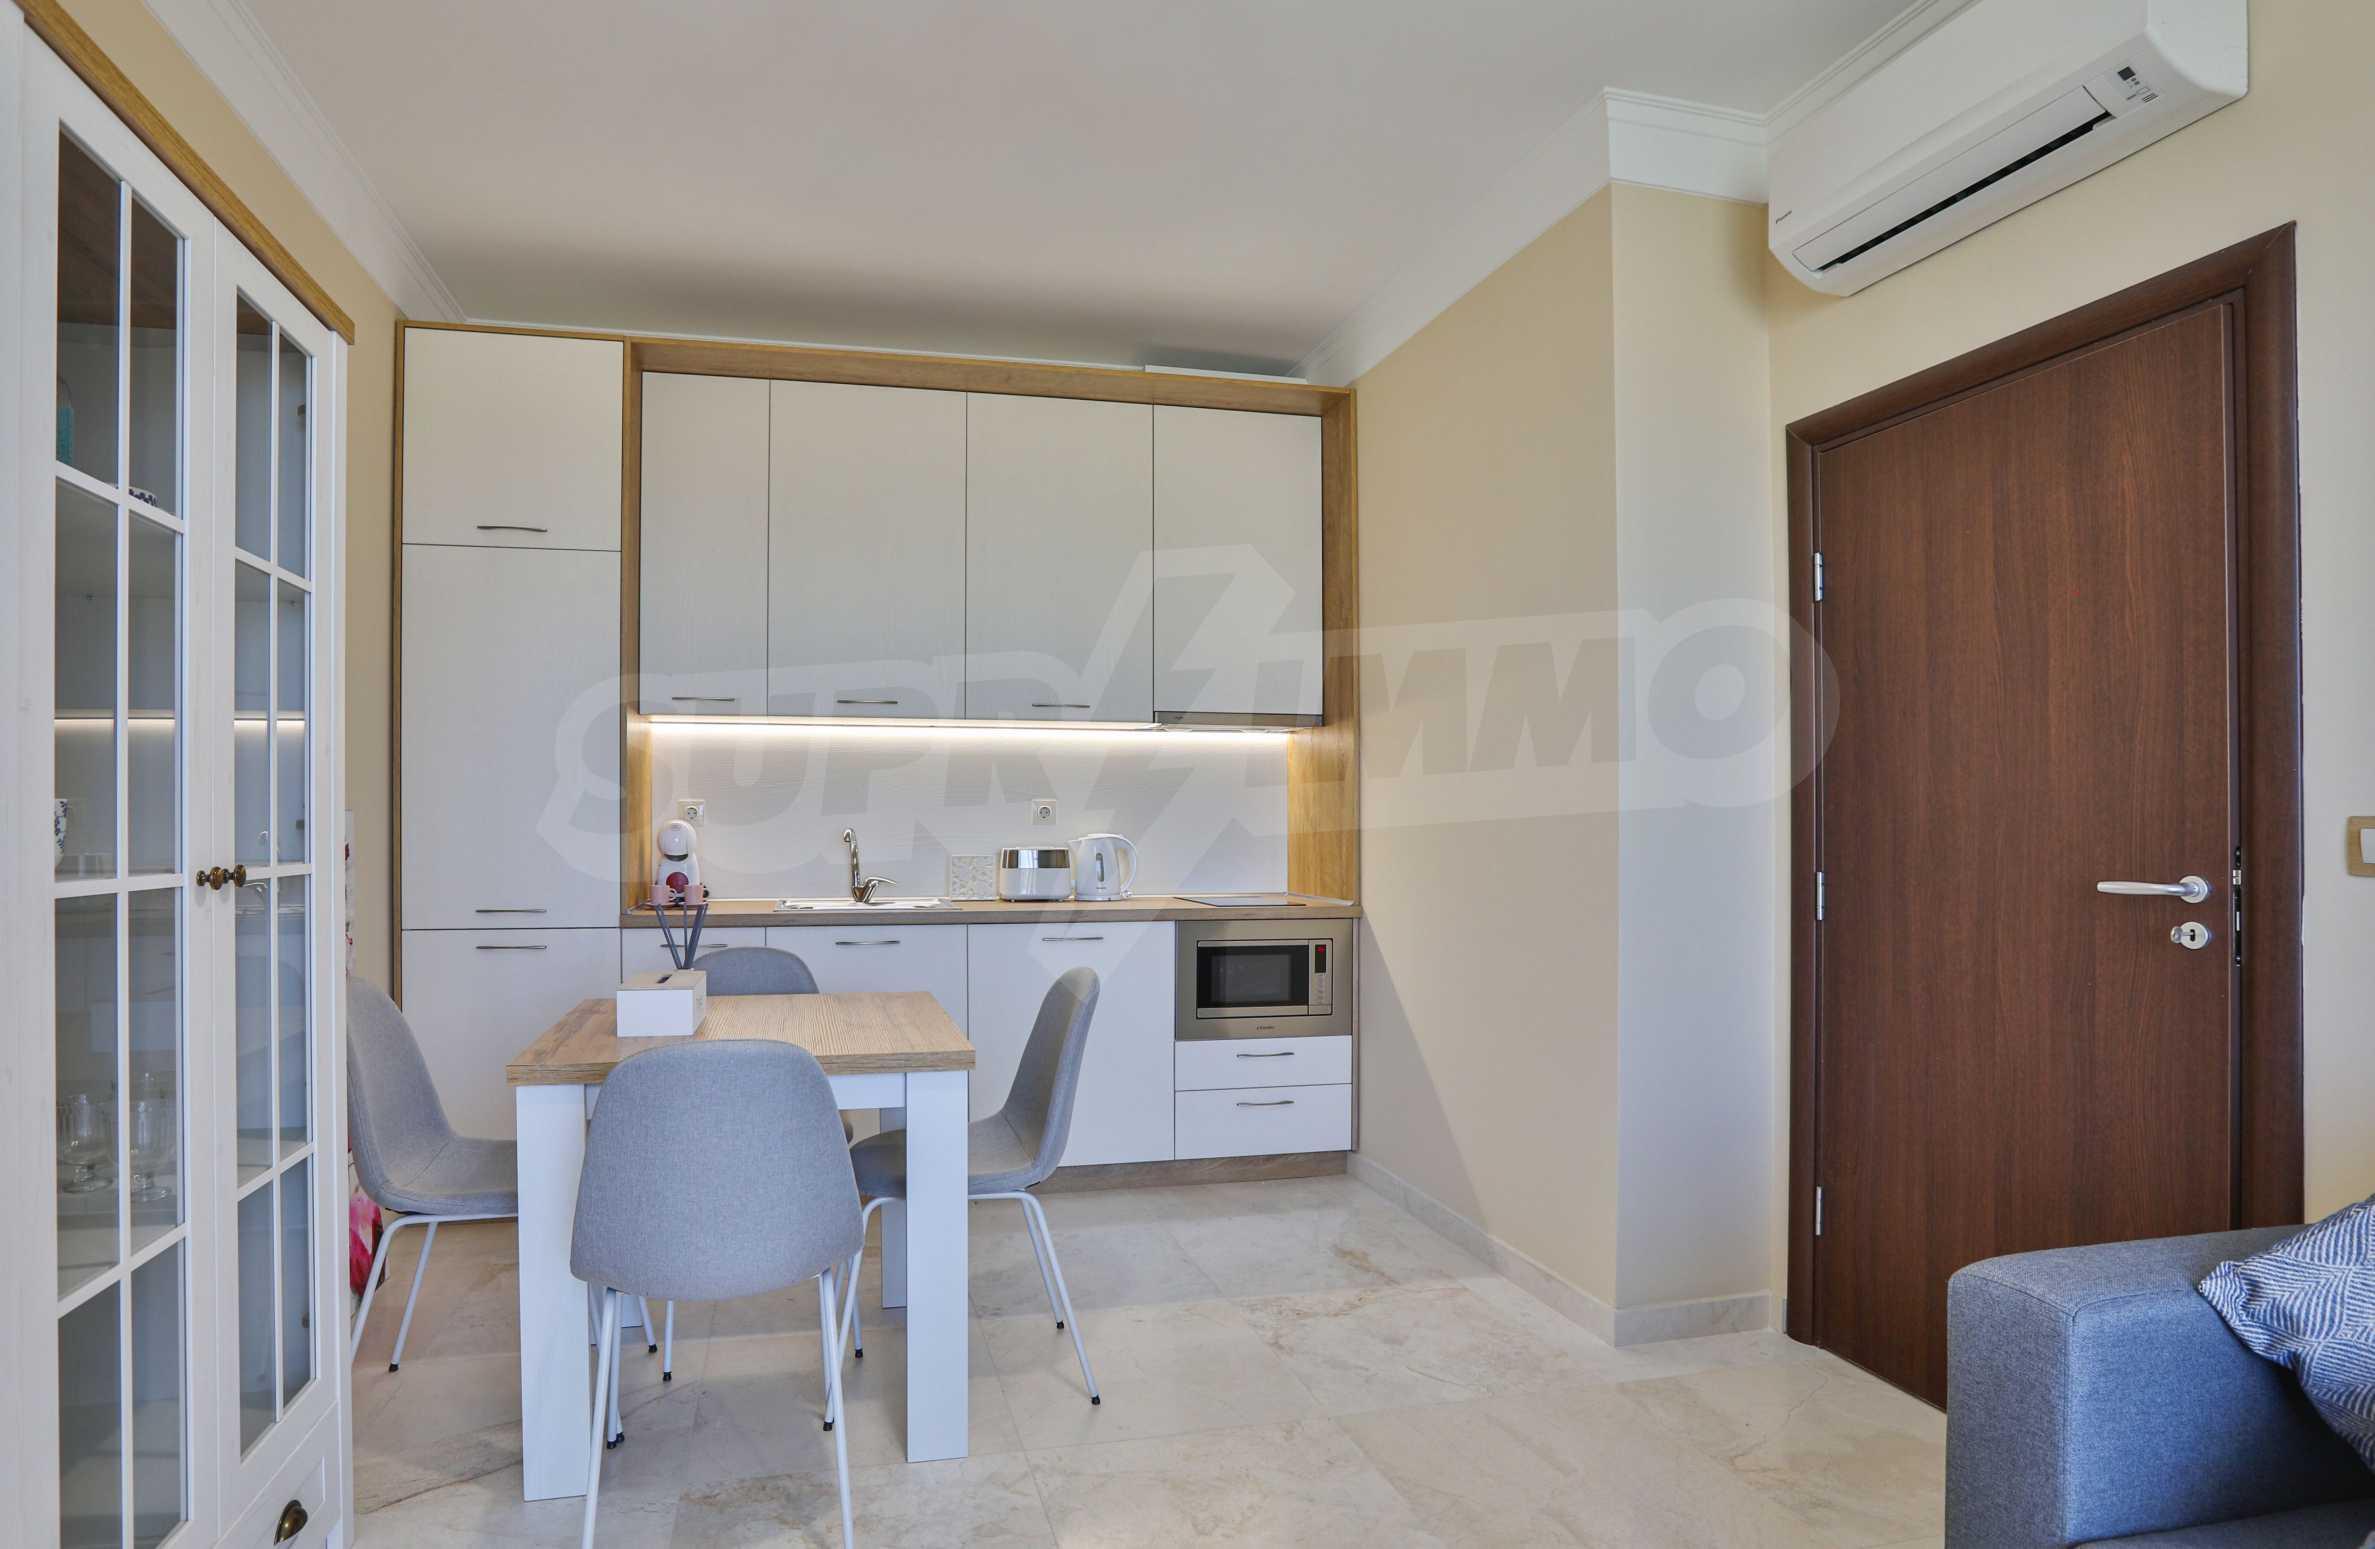 Първокласен двустаен апартамент в Belle Époque Beach Residence (ап. №A 206) 6